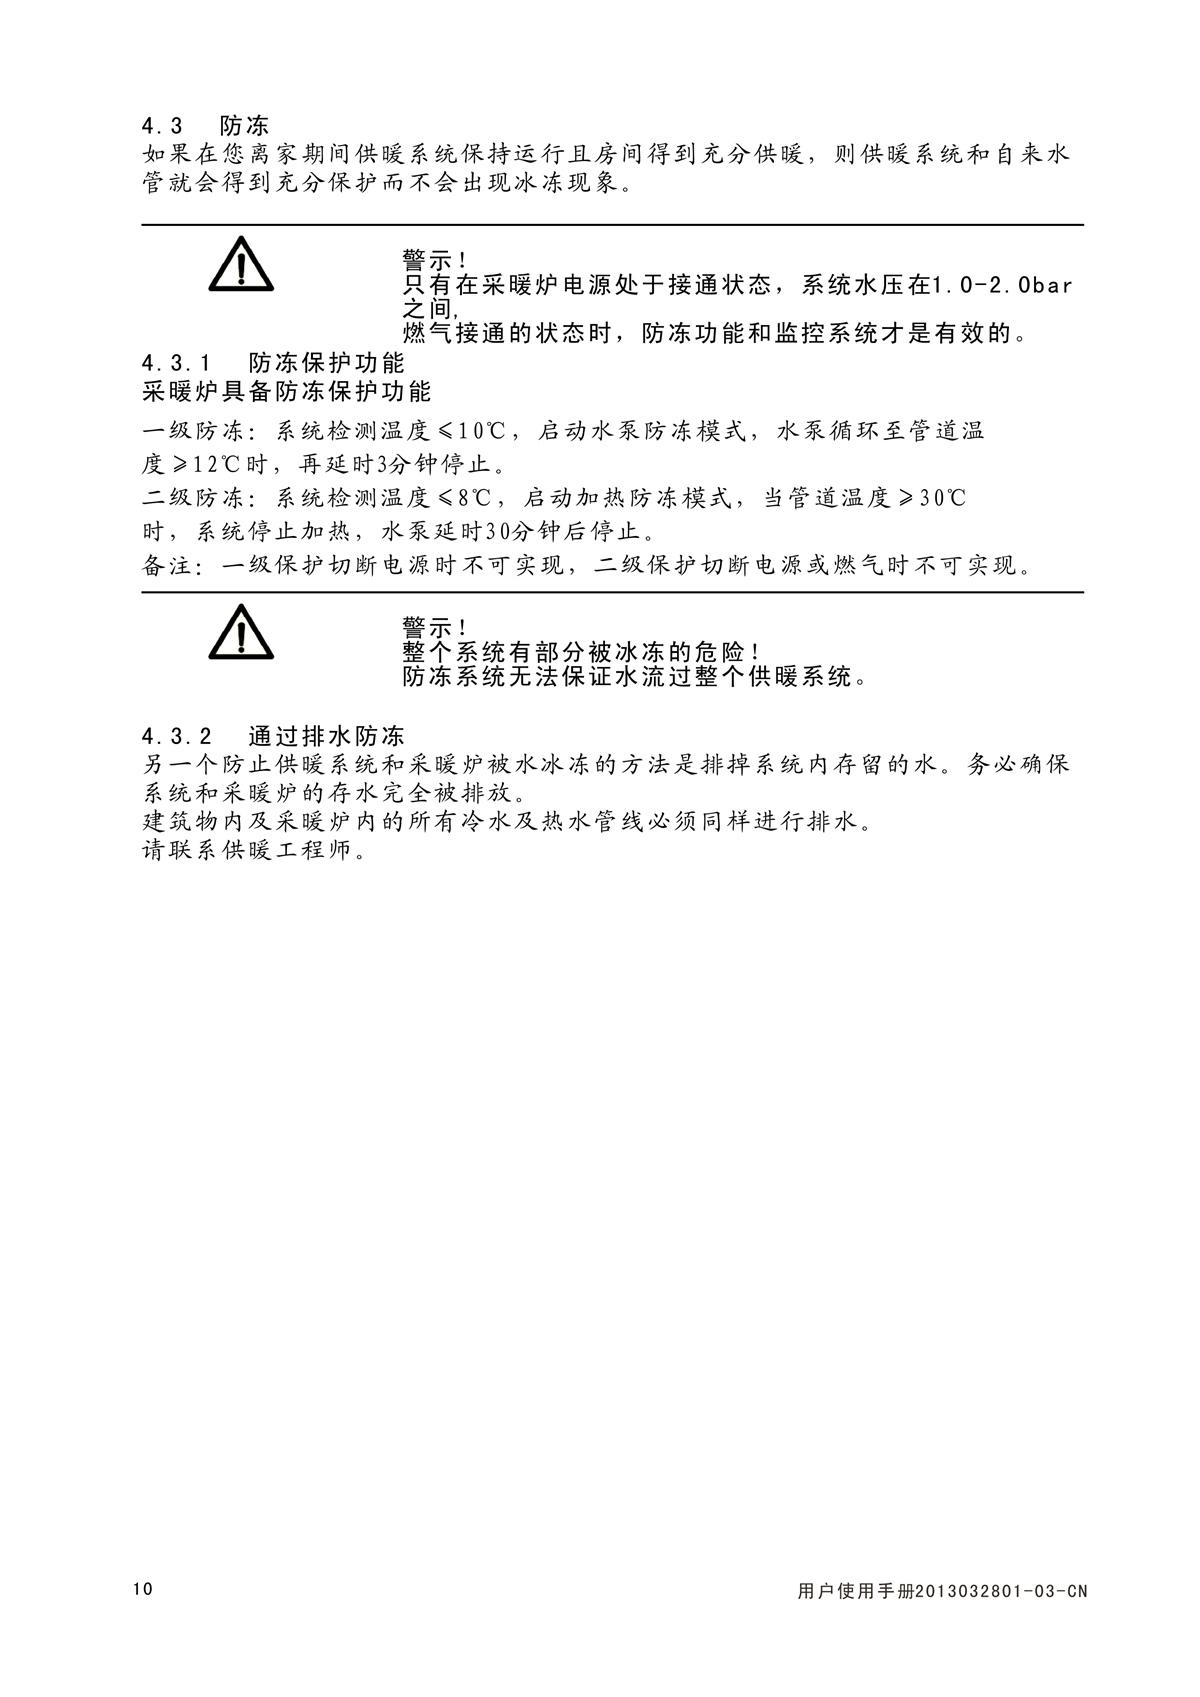 ES03系列-用户使用手册-8_01.jpg